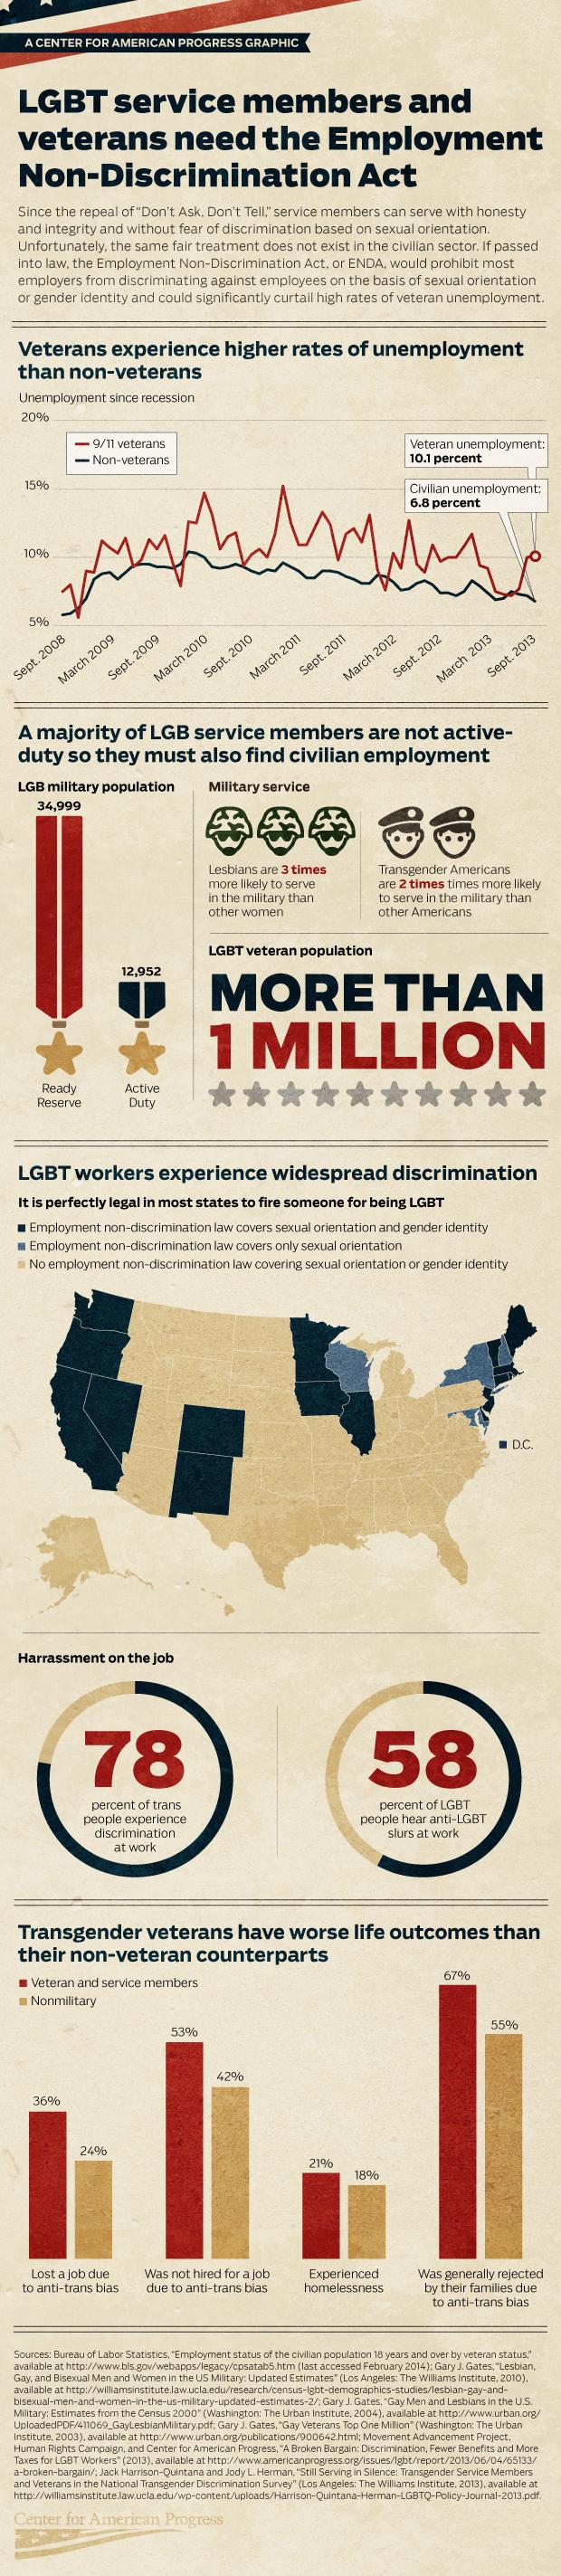 LGBT Veterans and Discrimination